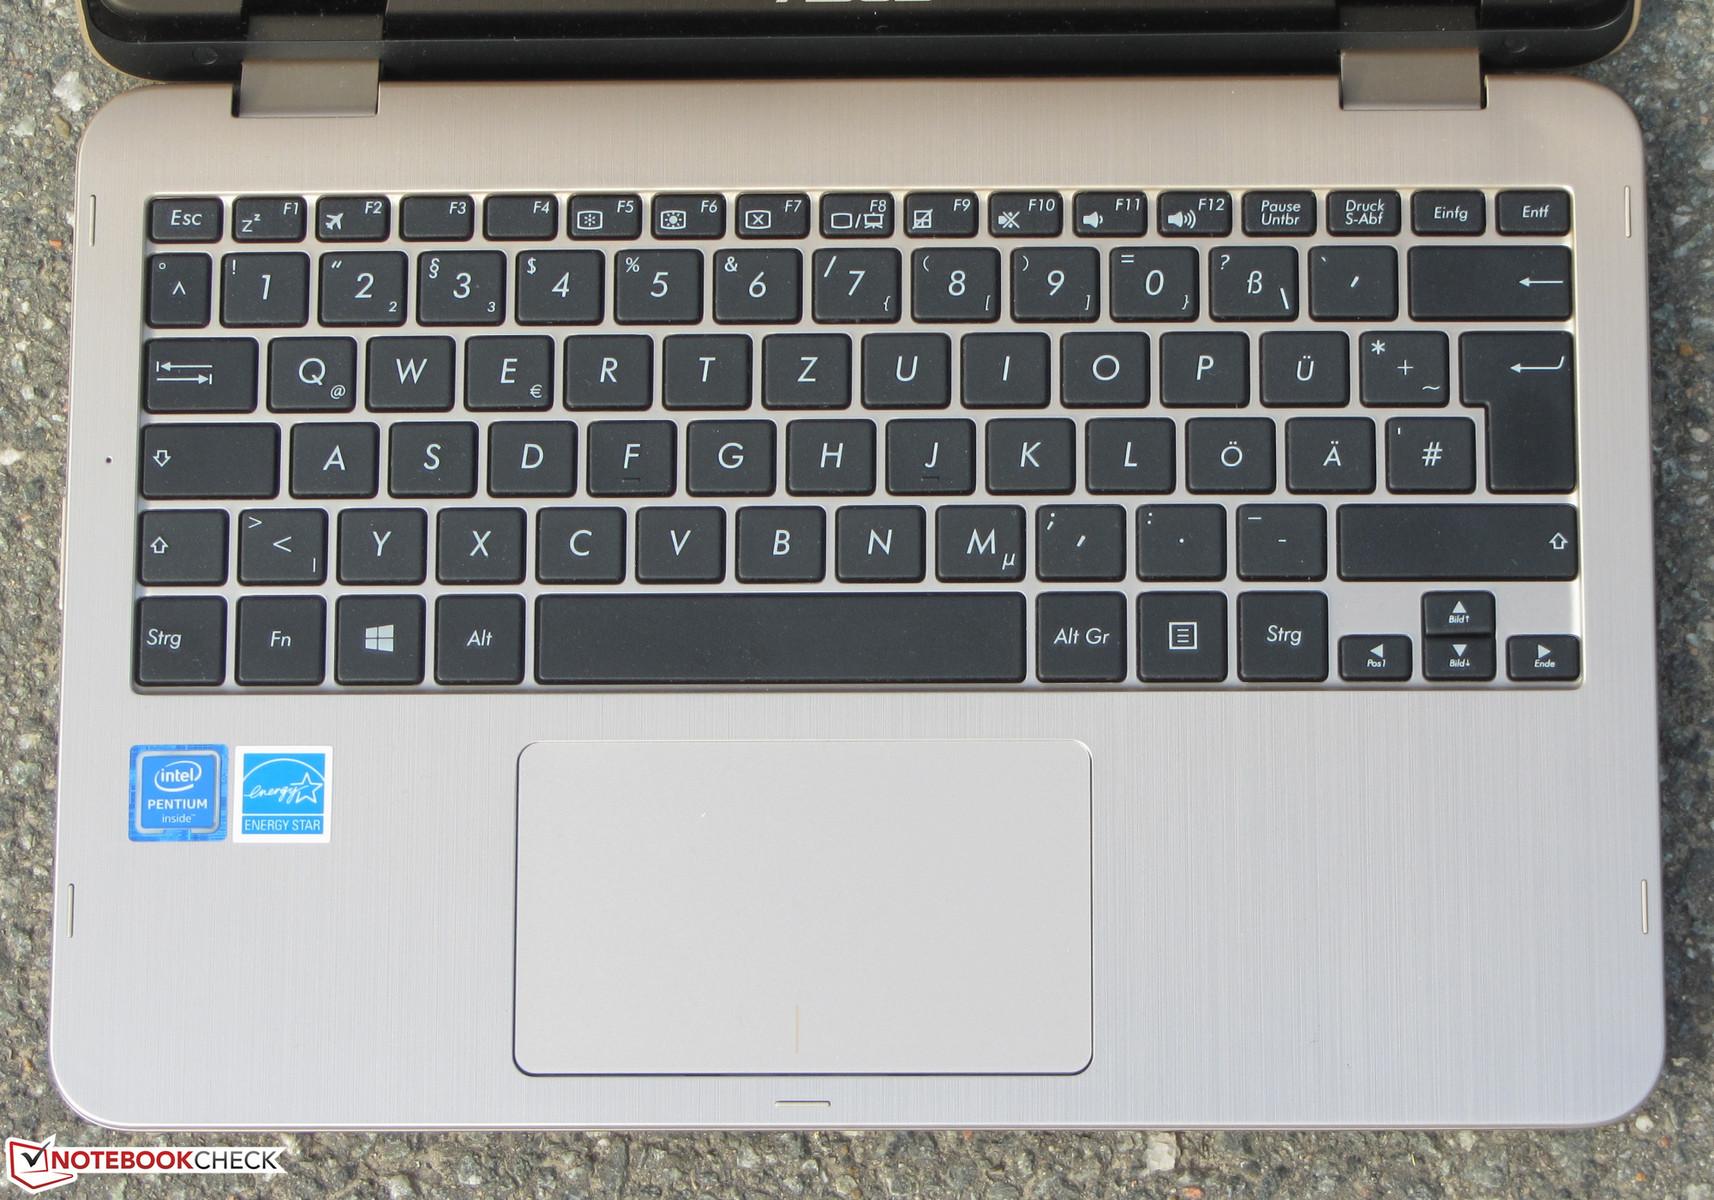 Asus Vivobook Flip 12 Tp203nah N4200 Hd Laptop Review